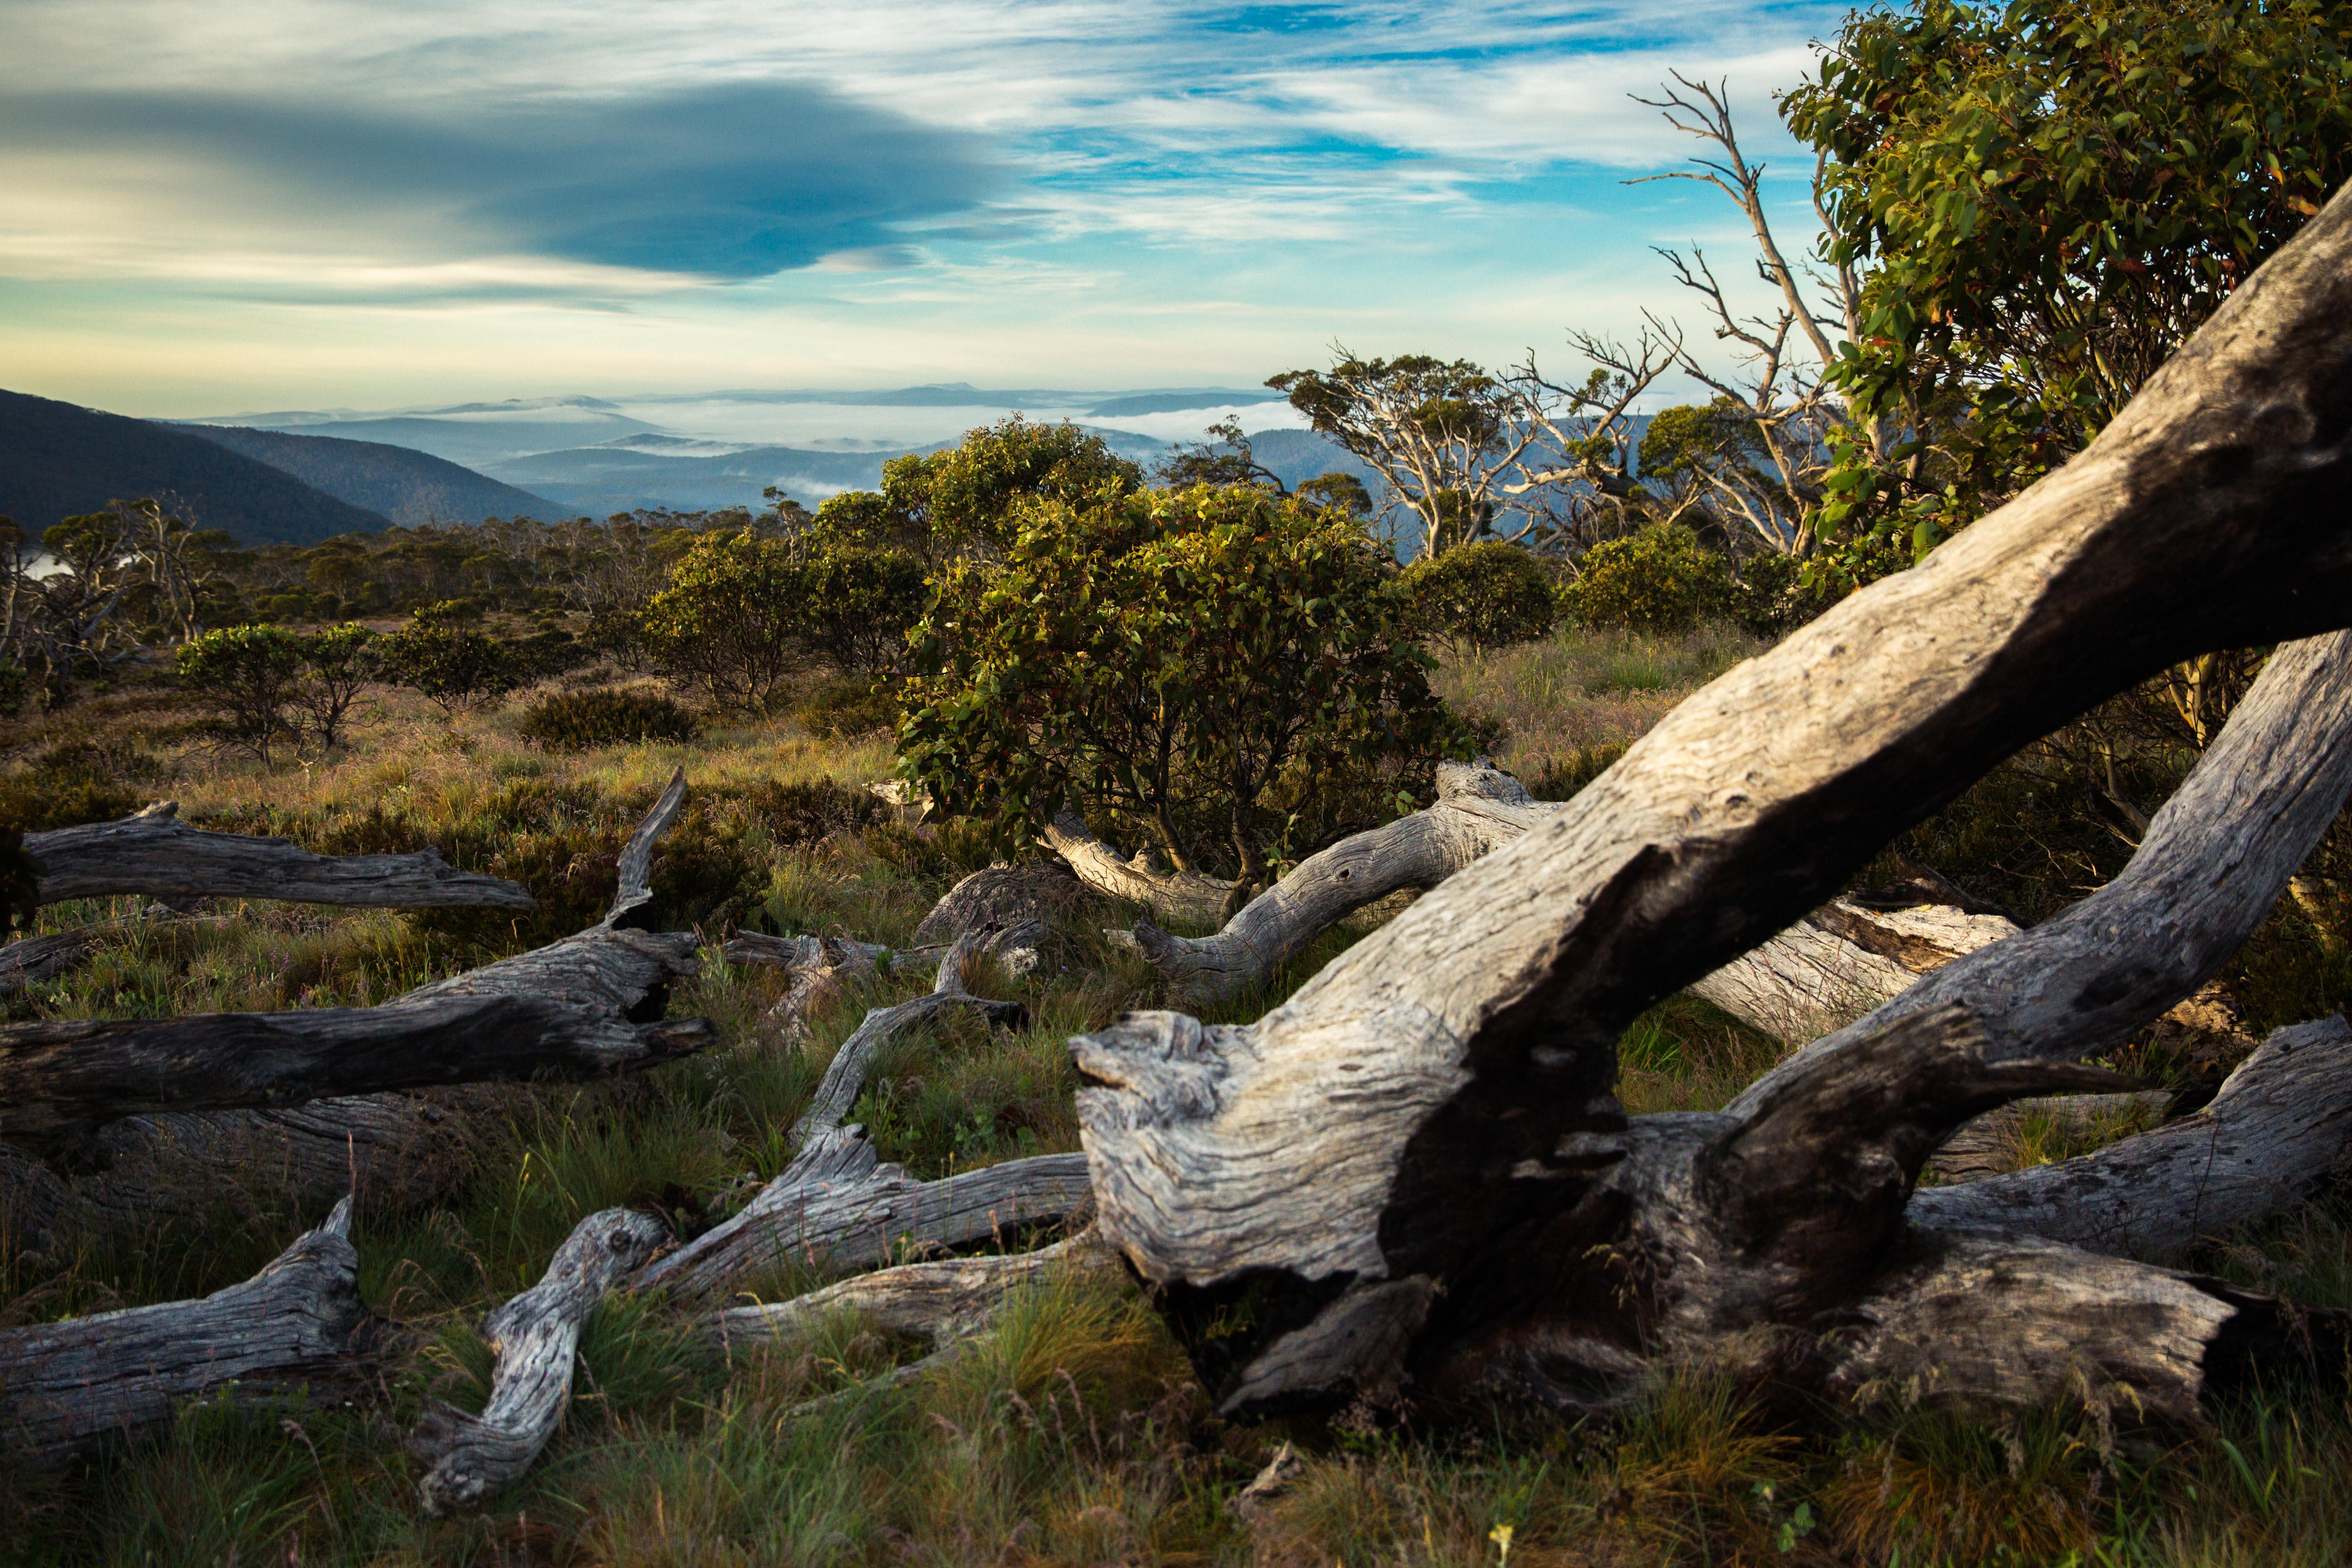 Stromlo National round and the Brindabella Range